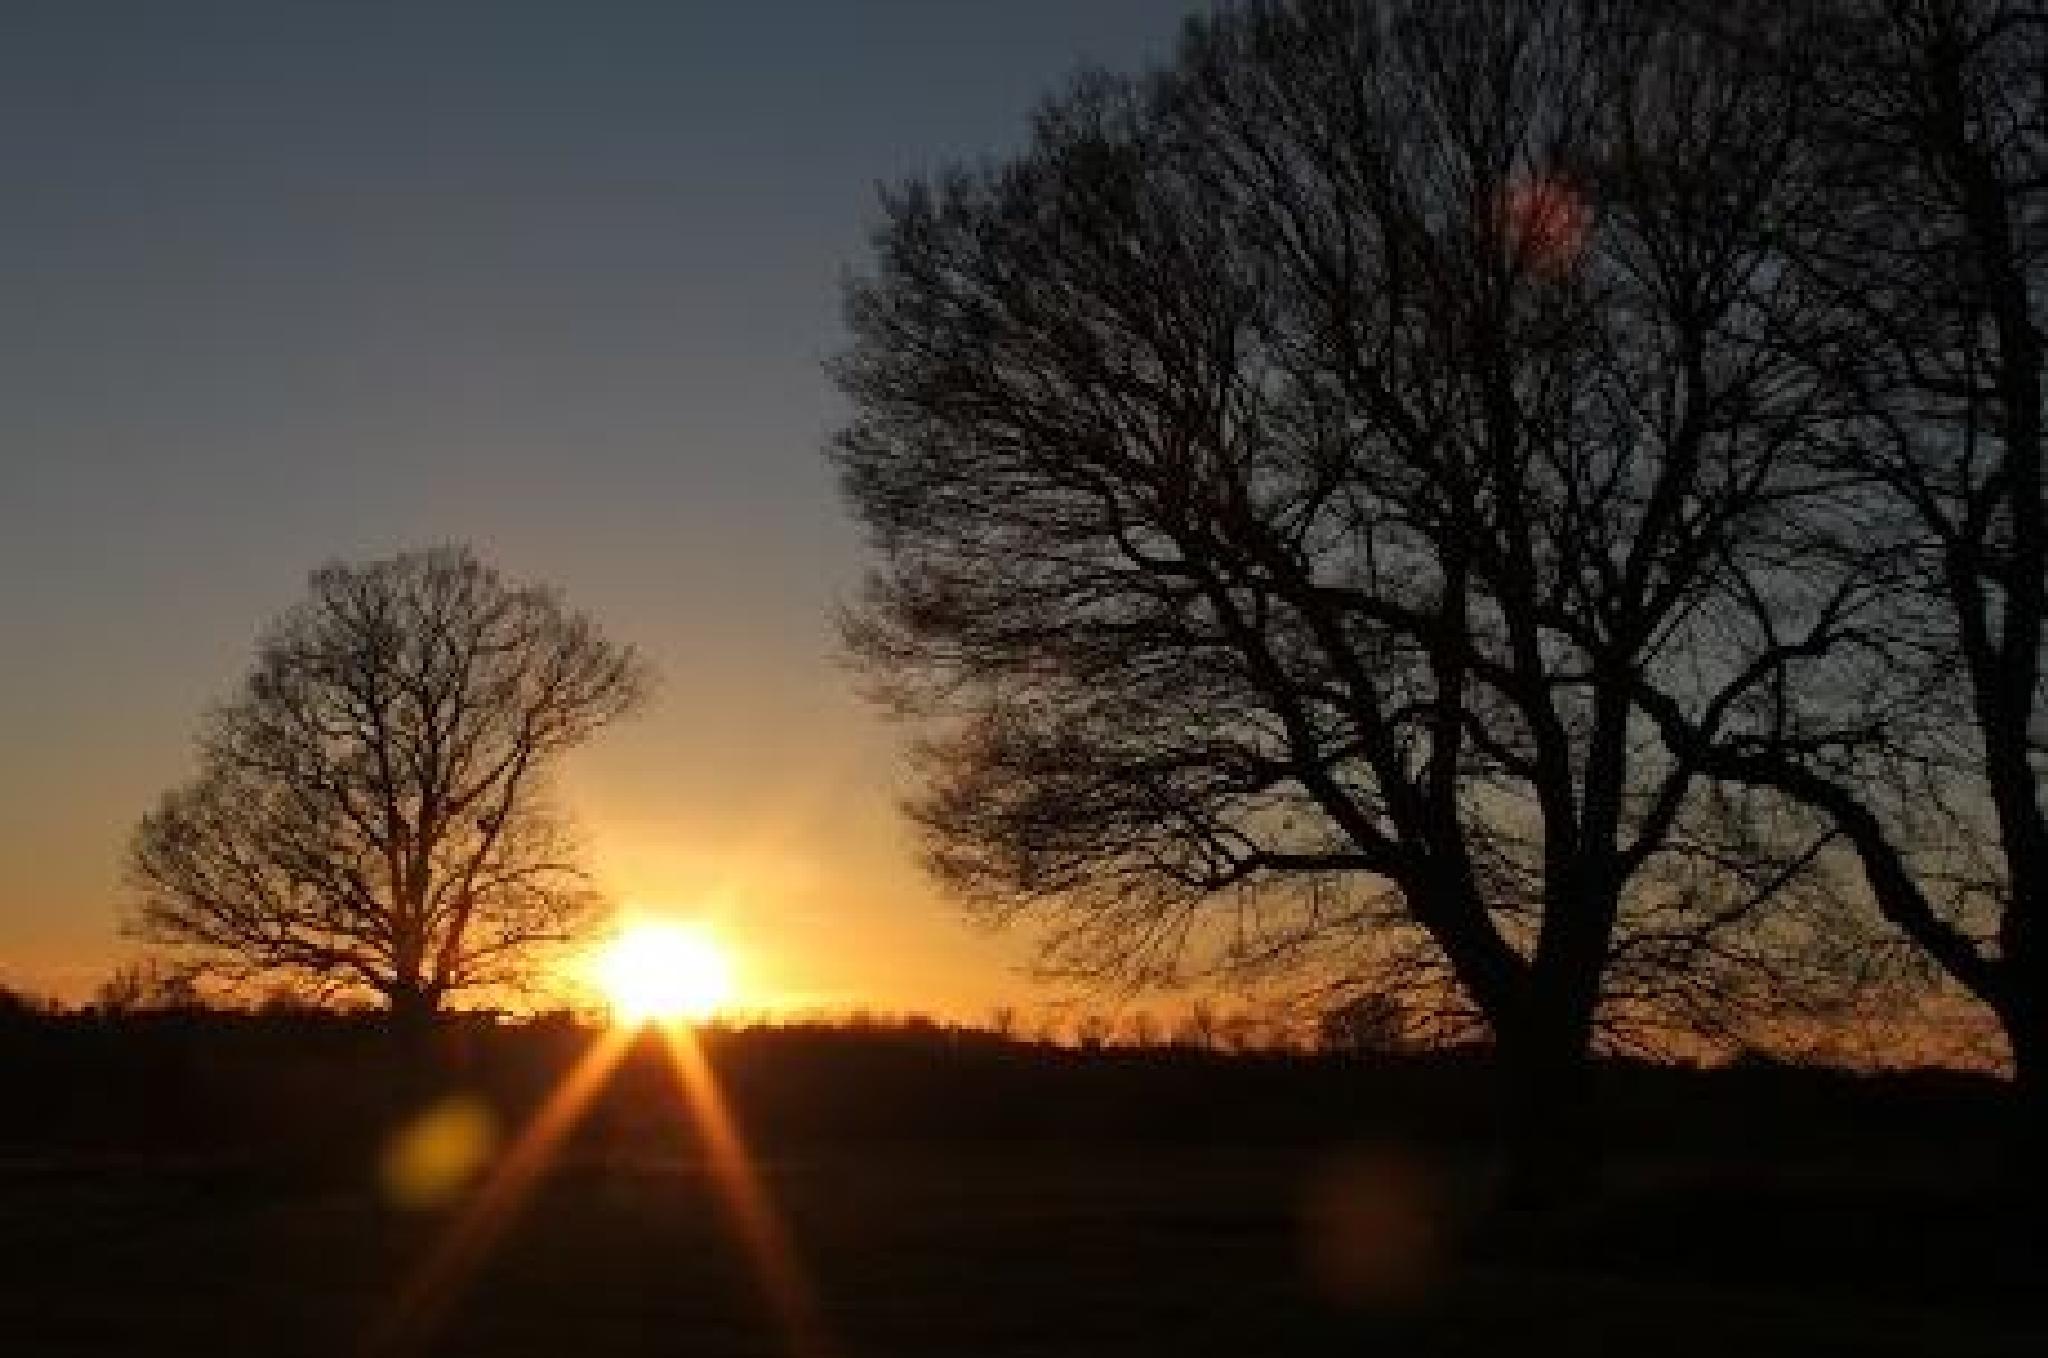 Sunset by gary.macnicol